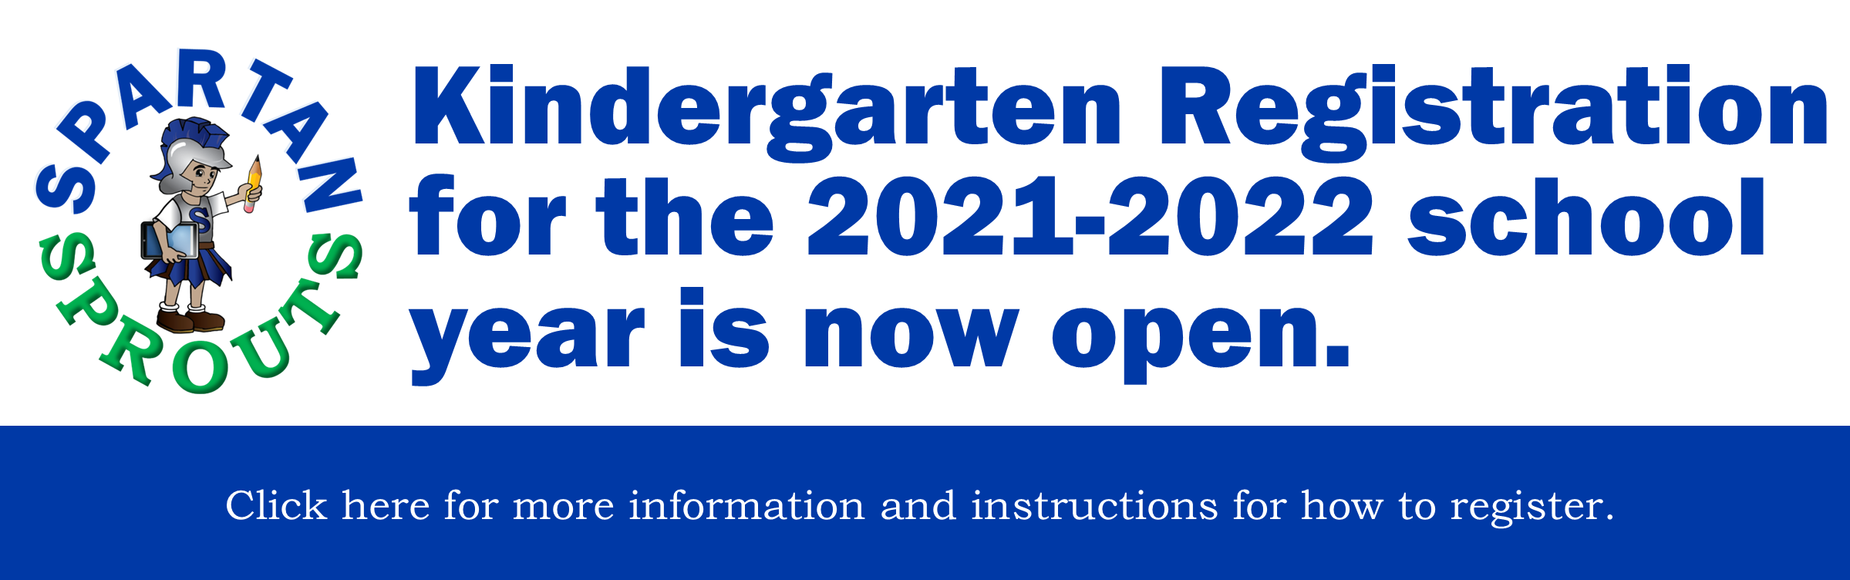 Kindergarten Registration 21-22 Open Banner Image